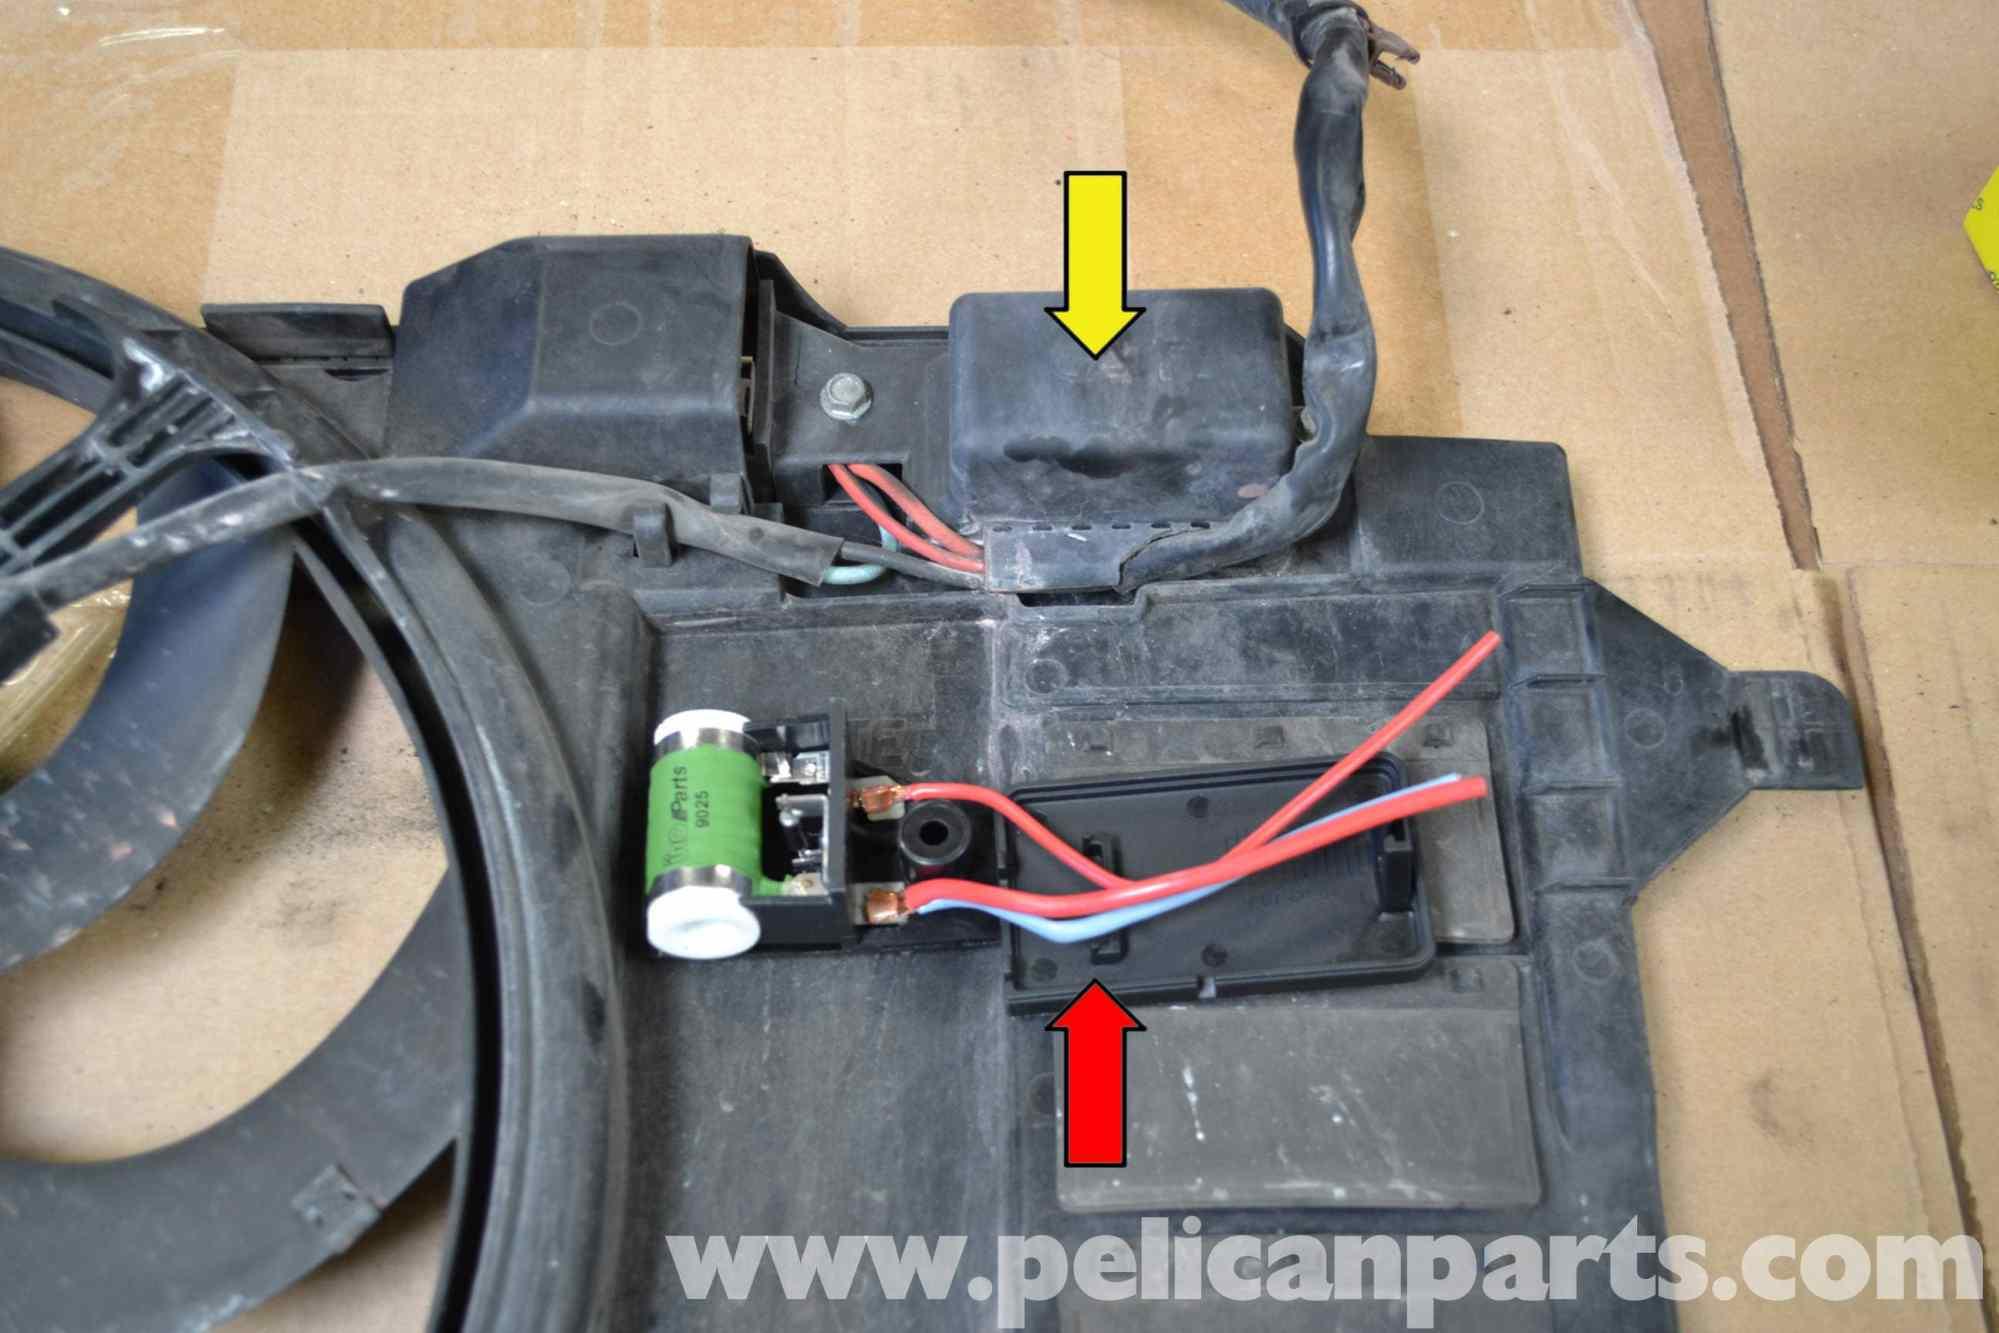 hight resolution of 2002 mini cooper fan wiring diagram wiring diagrams wni fan relay wiring diagram mini r53 cooling